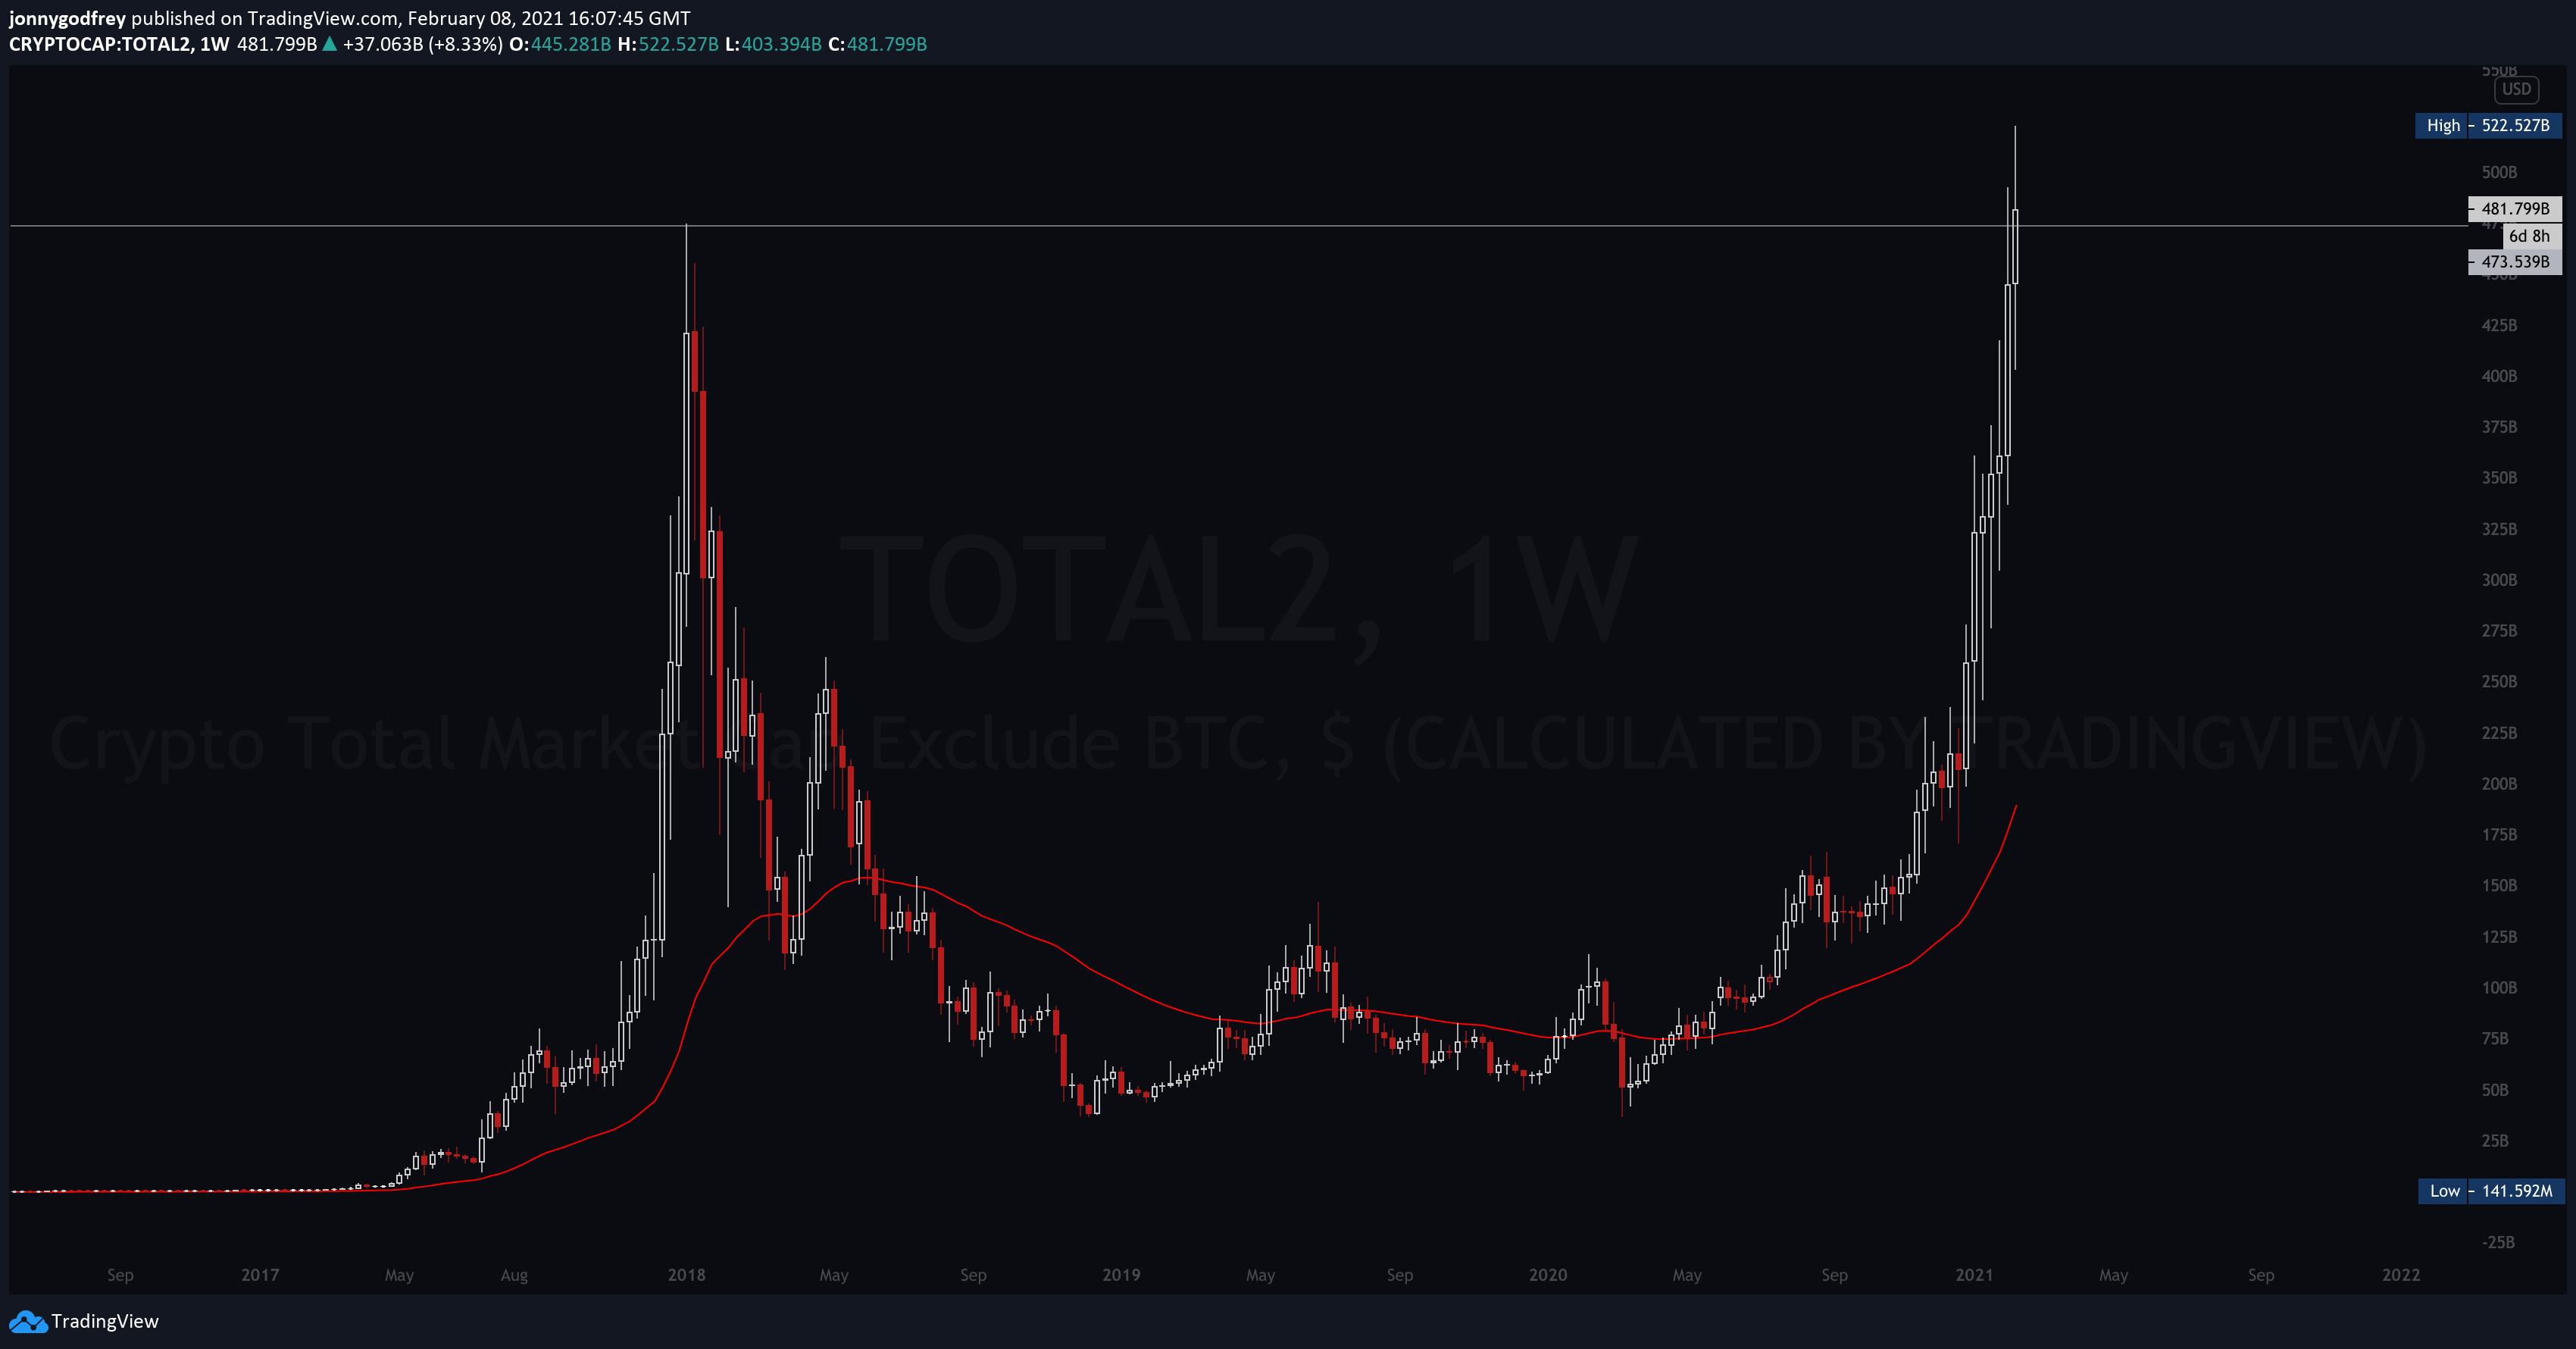 Crypto market cap, without BTC